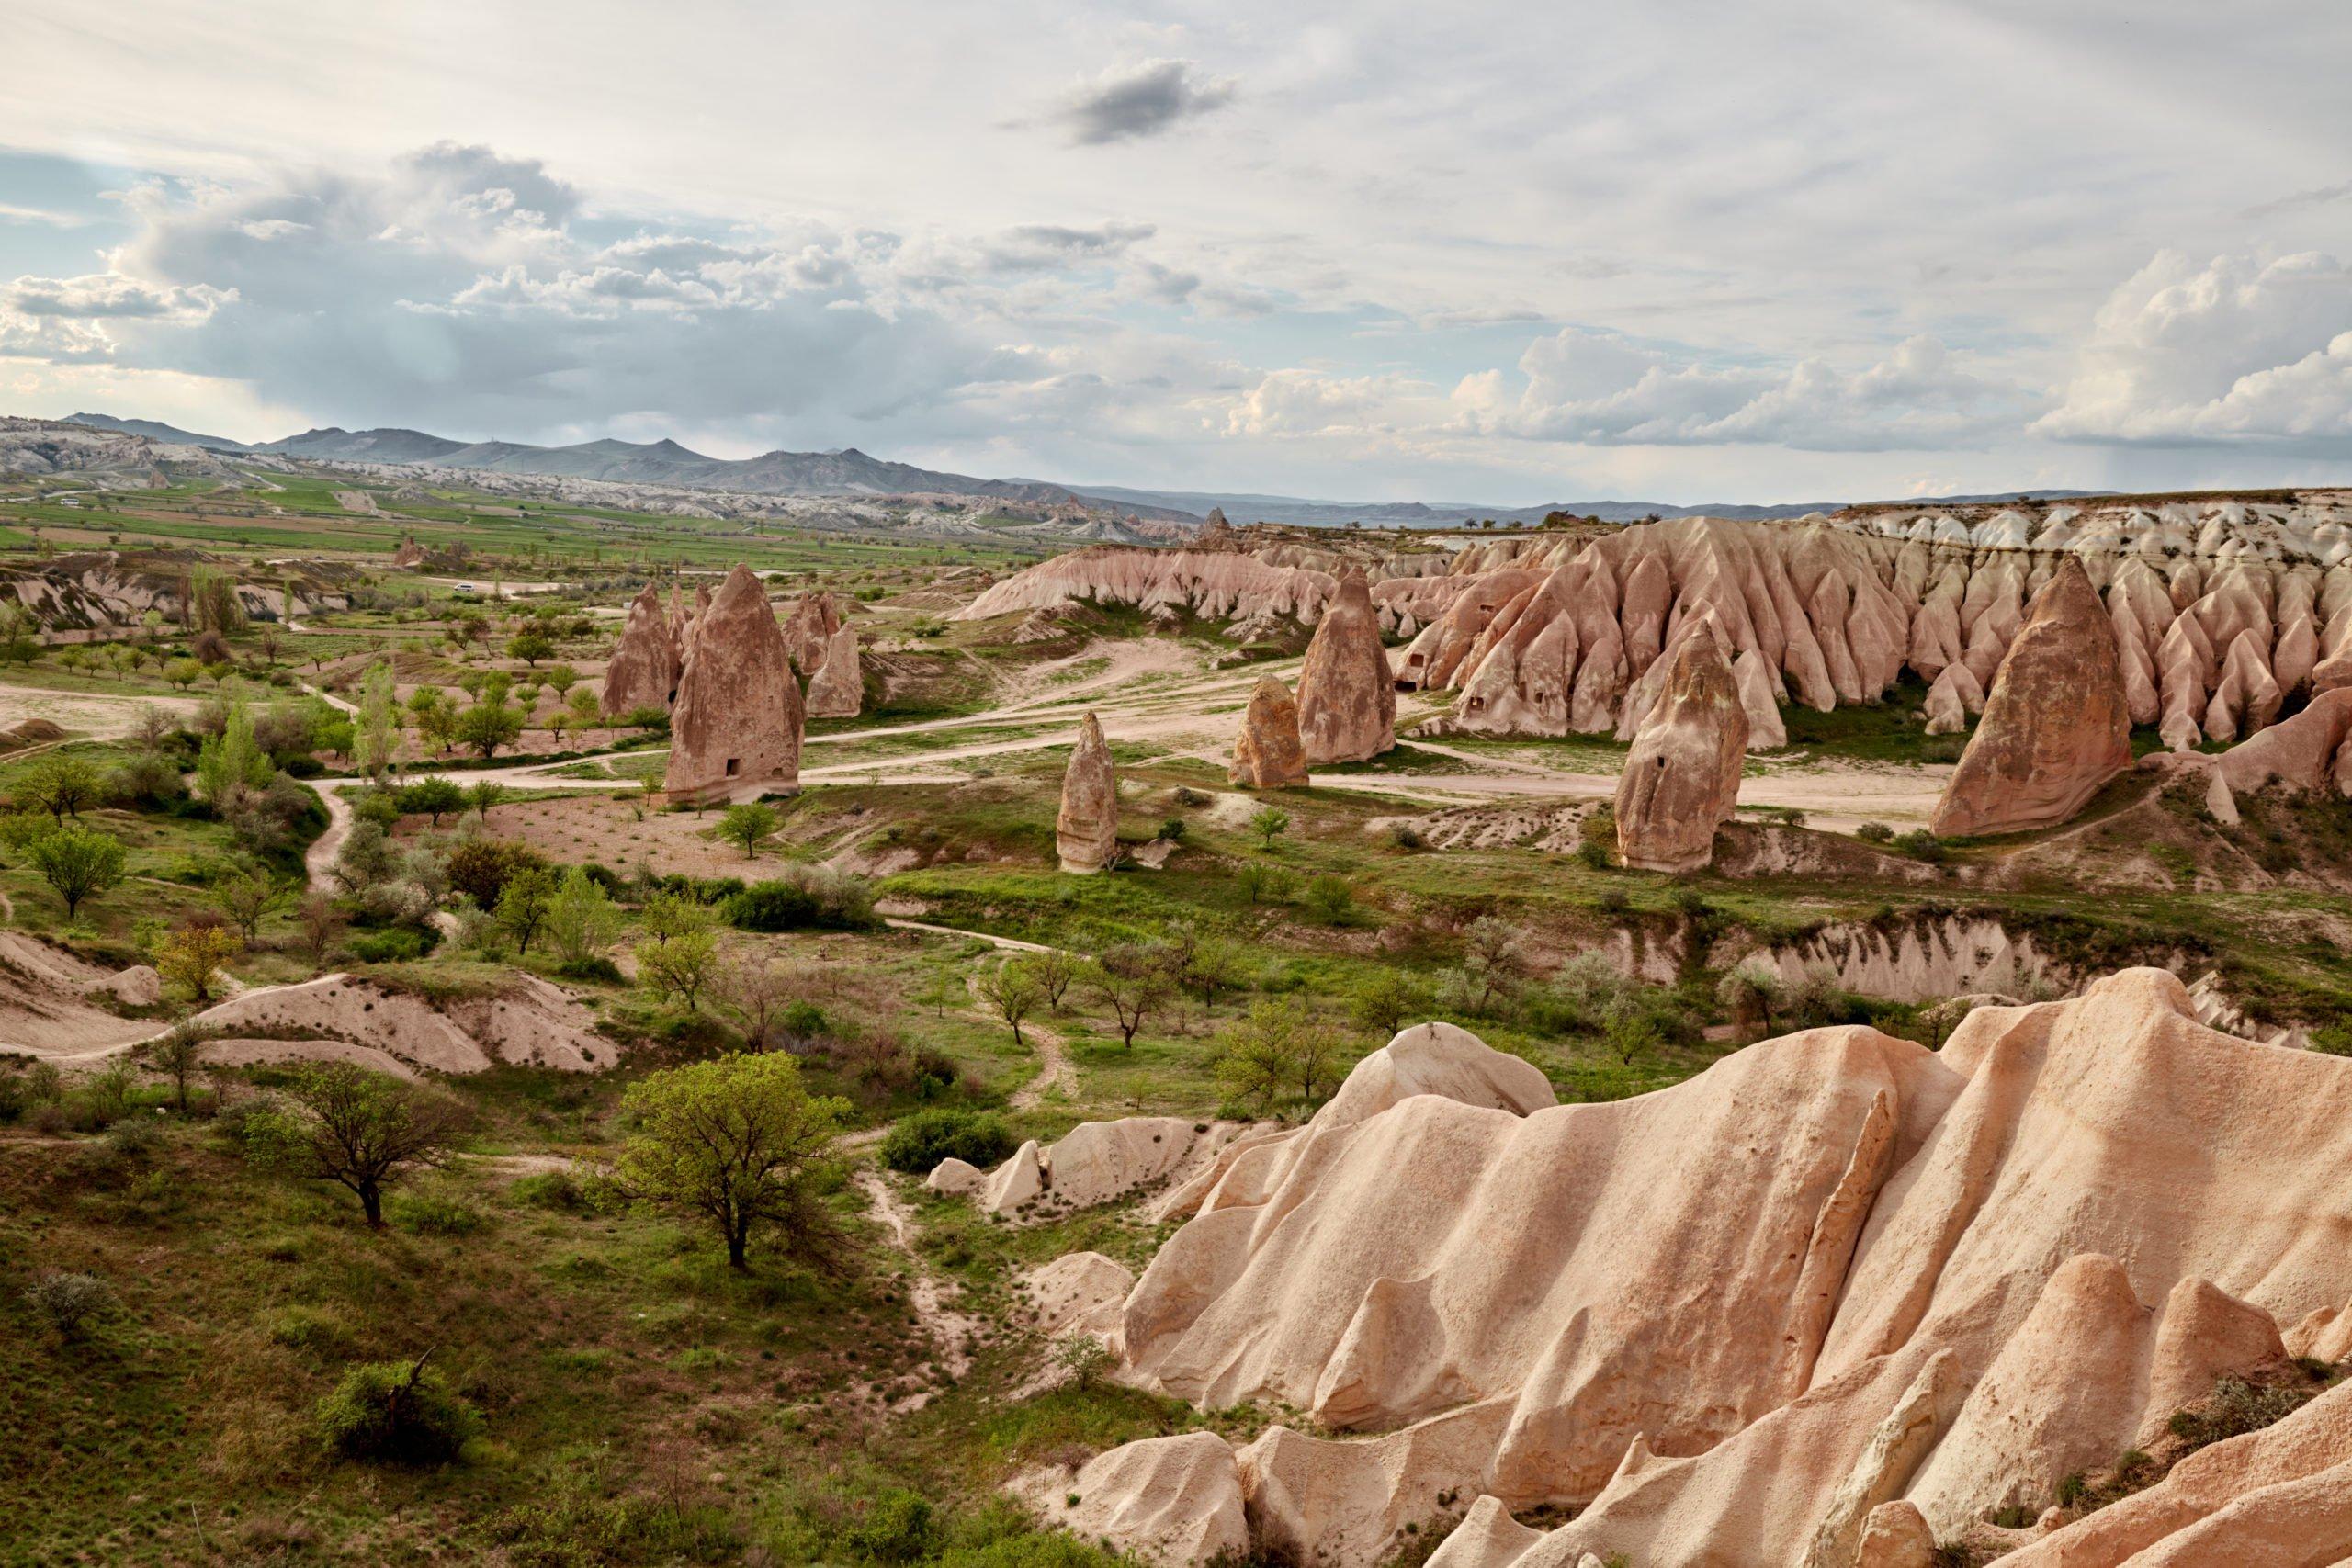 Take A Stroll Through Meskendir Valley On The Southern Cappadocia Tour From Goreme